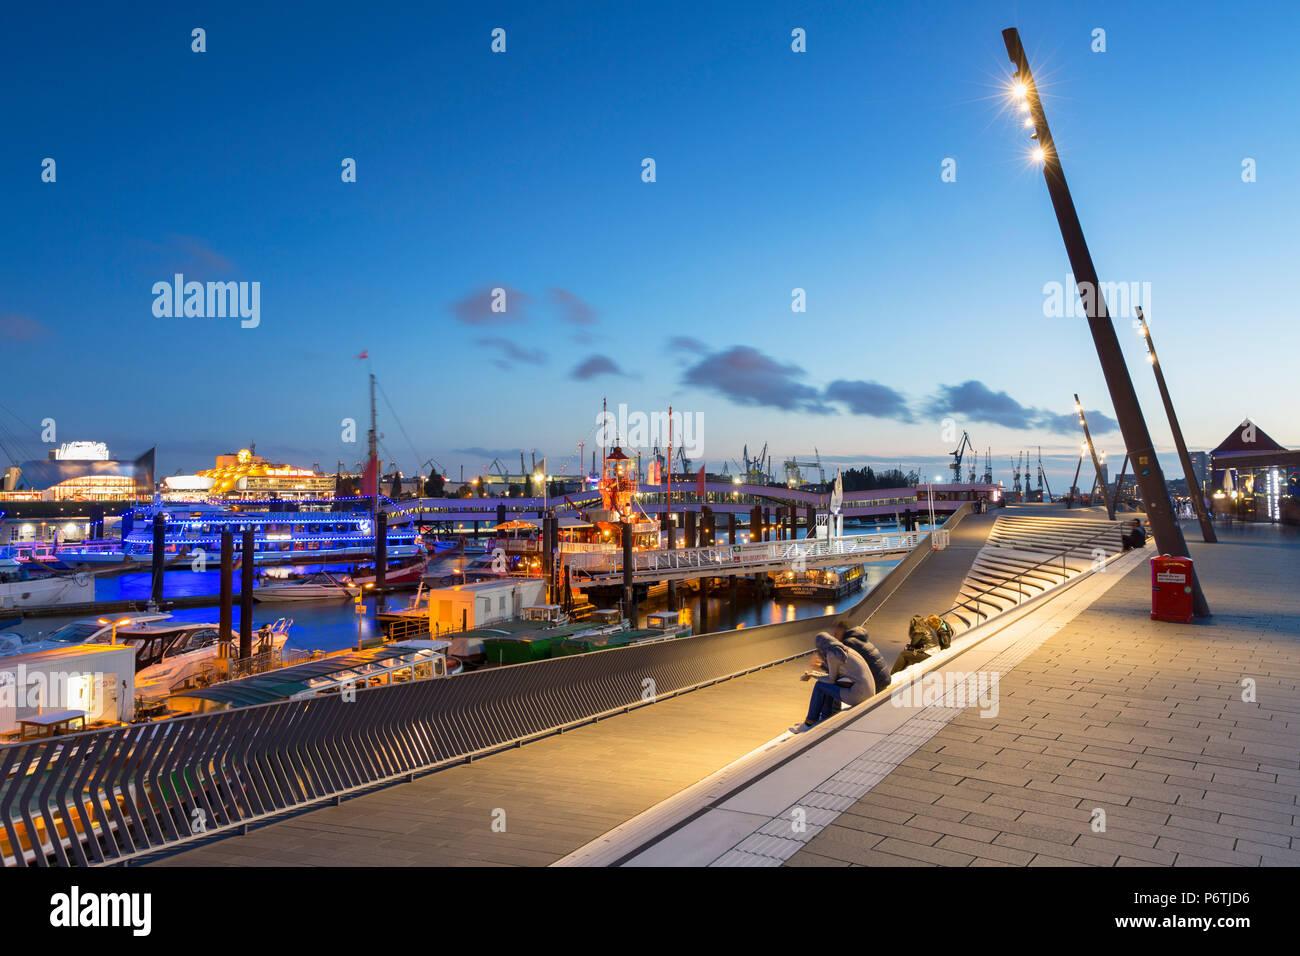 Elbpromenade and harbour, Hamburg, Germany - Stock Image